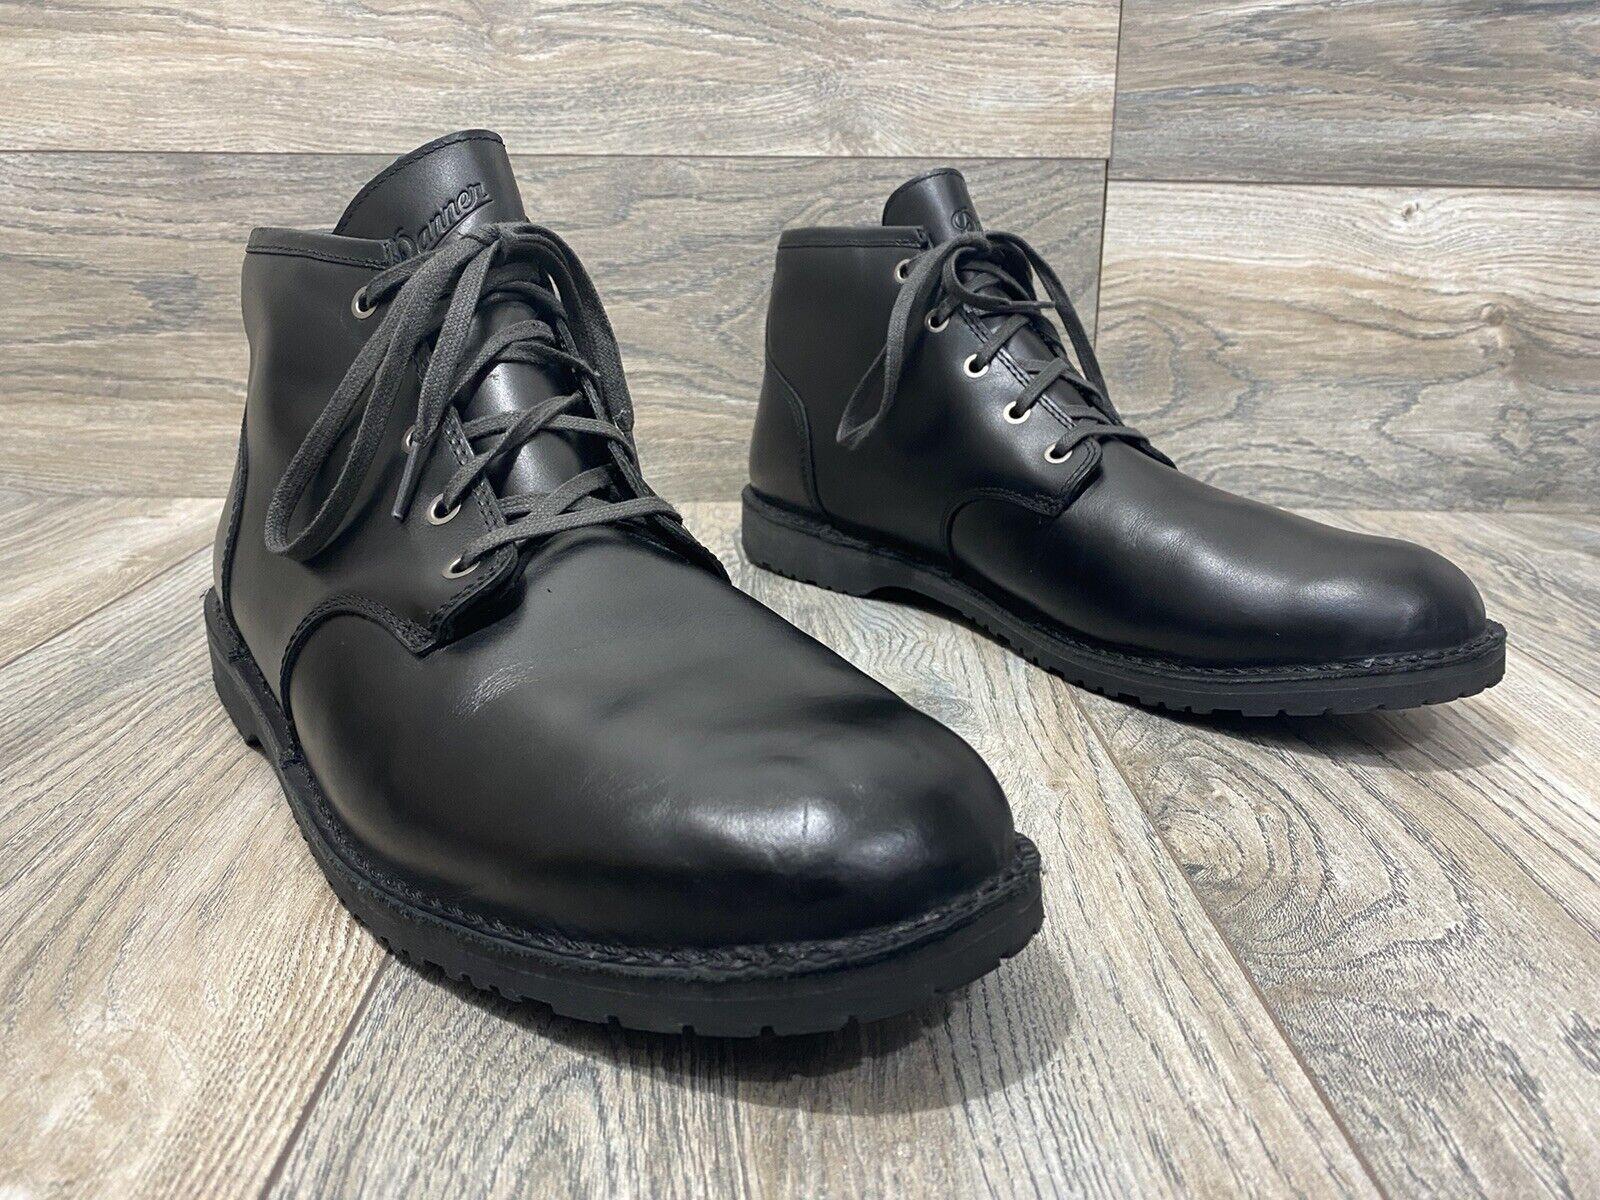 Danner Men's Wolf Creek Chukka Black Leather Boots | Size 13 | Comfort/Hiking